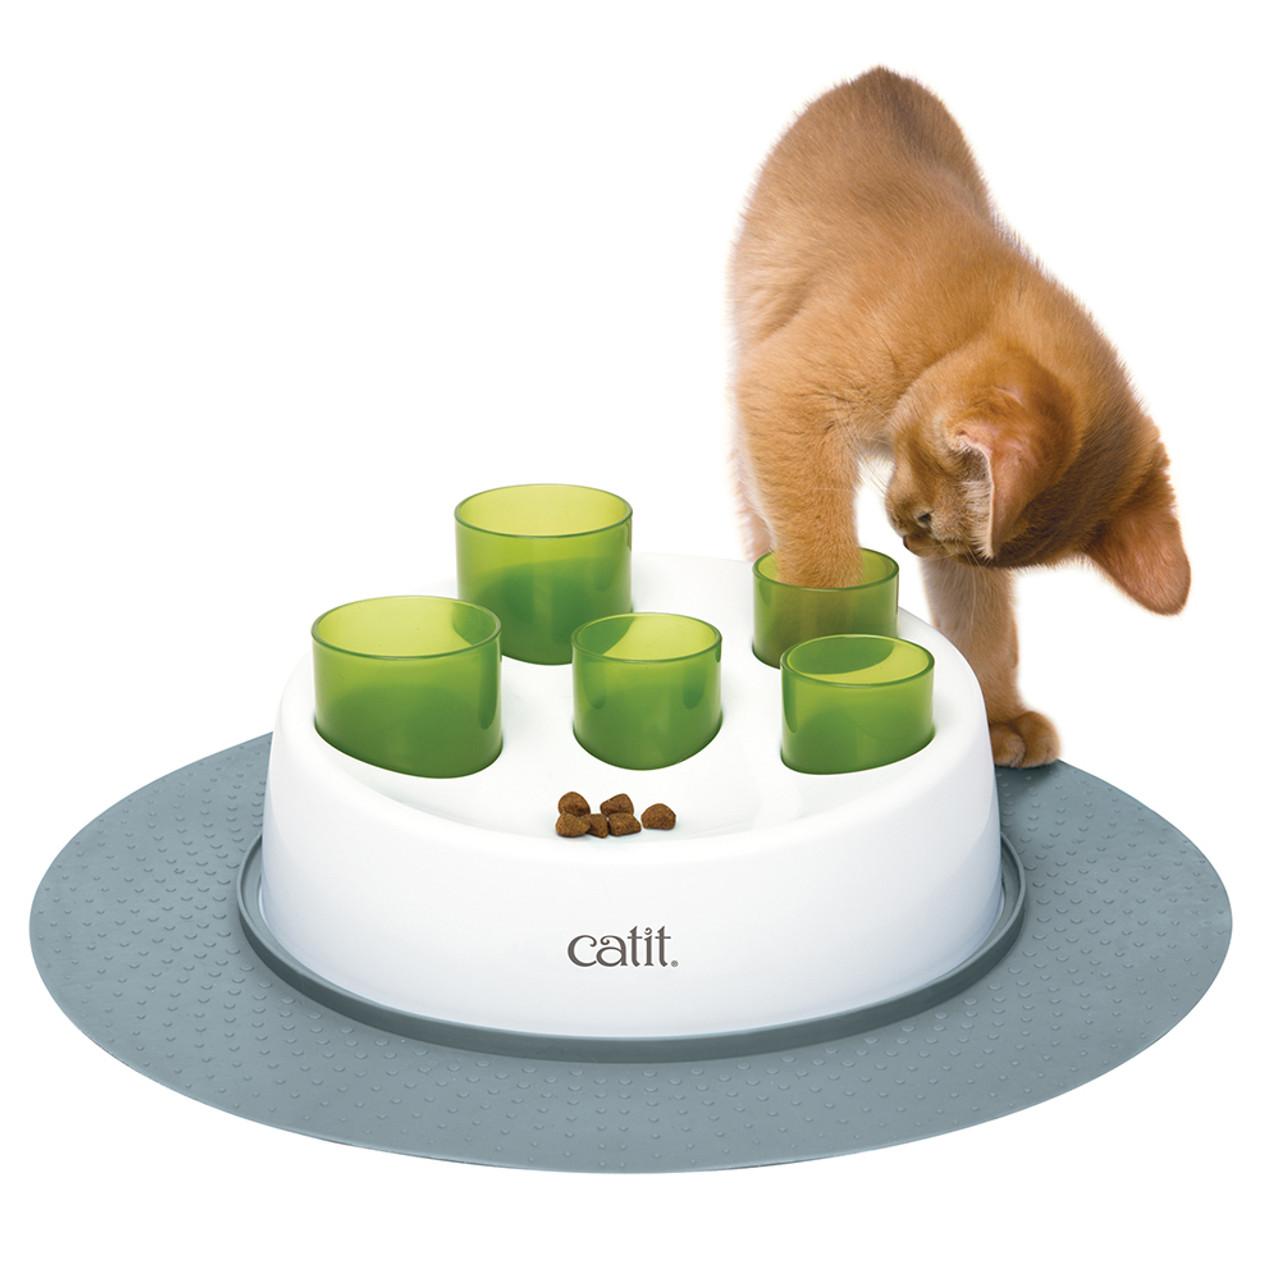 Catit Senses 2.0 Digger Treat Dispensing Cat Toy